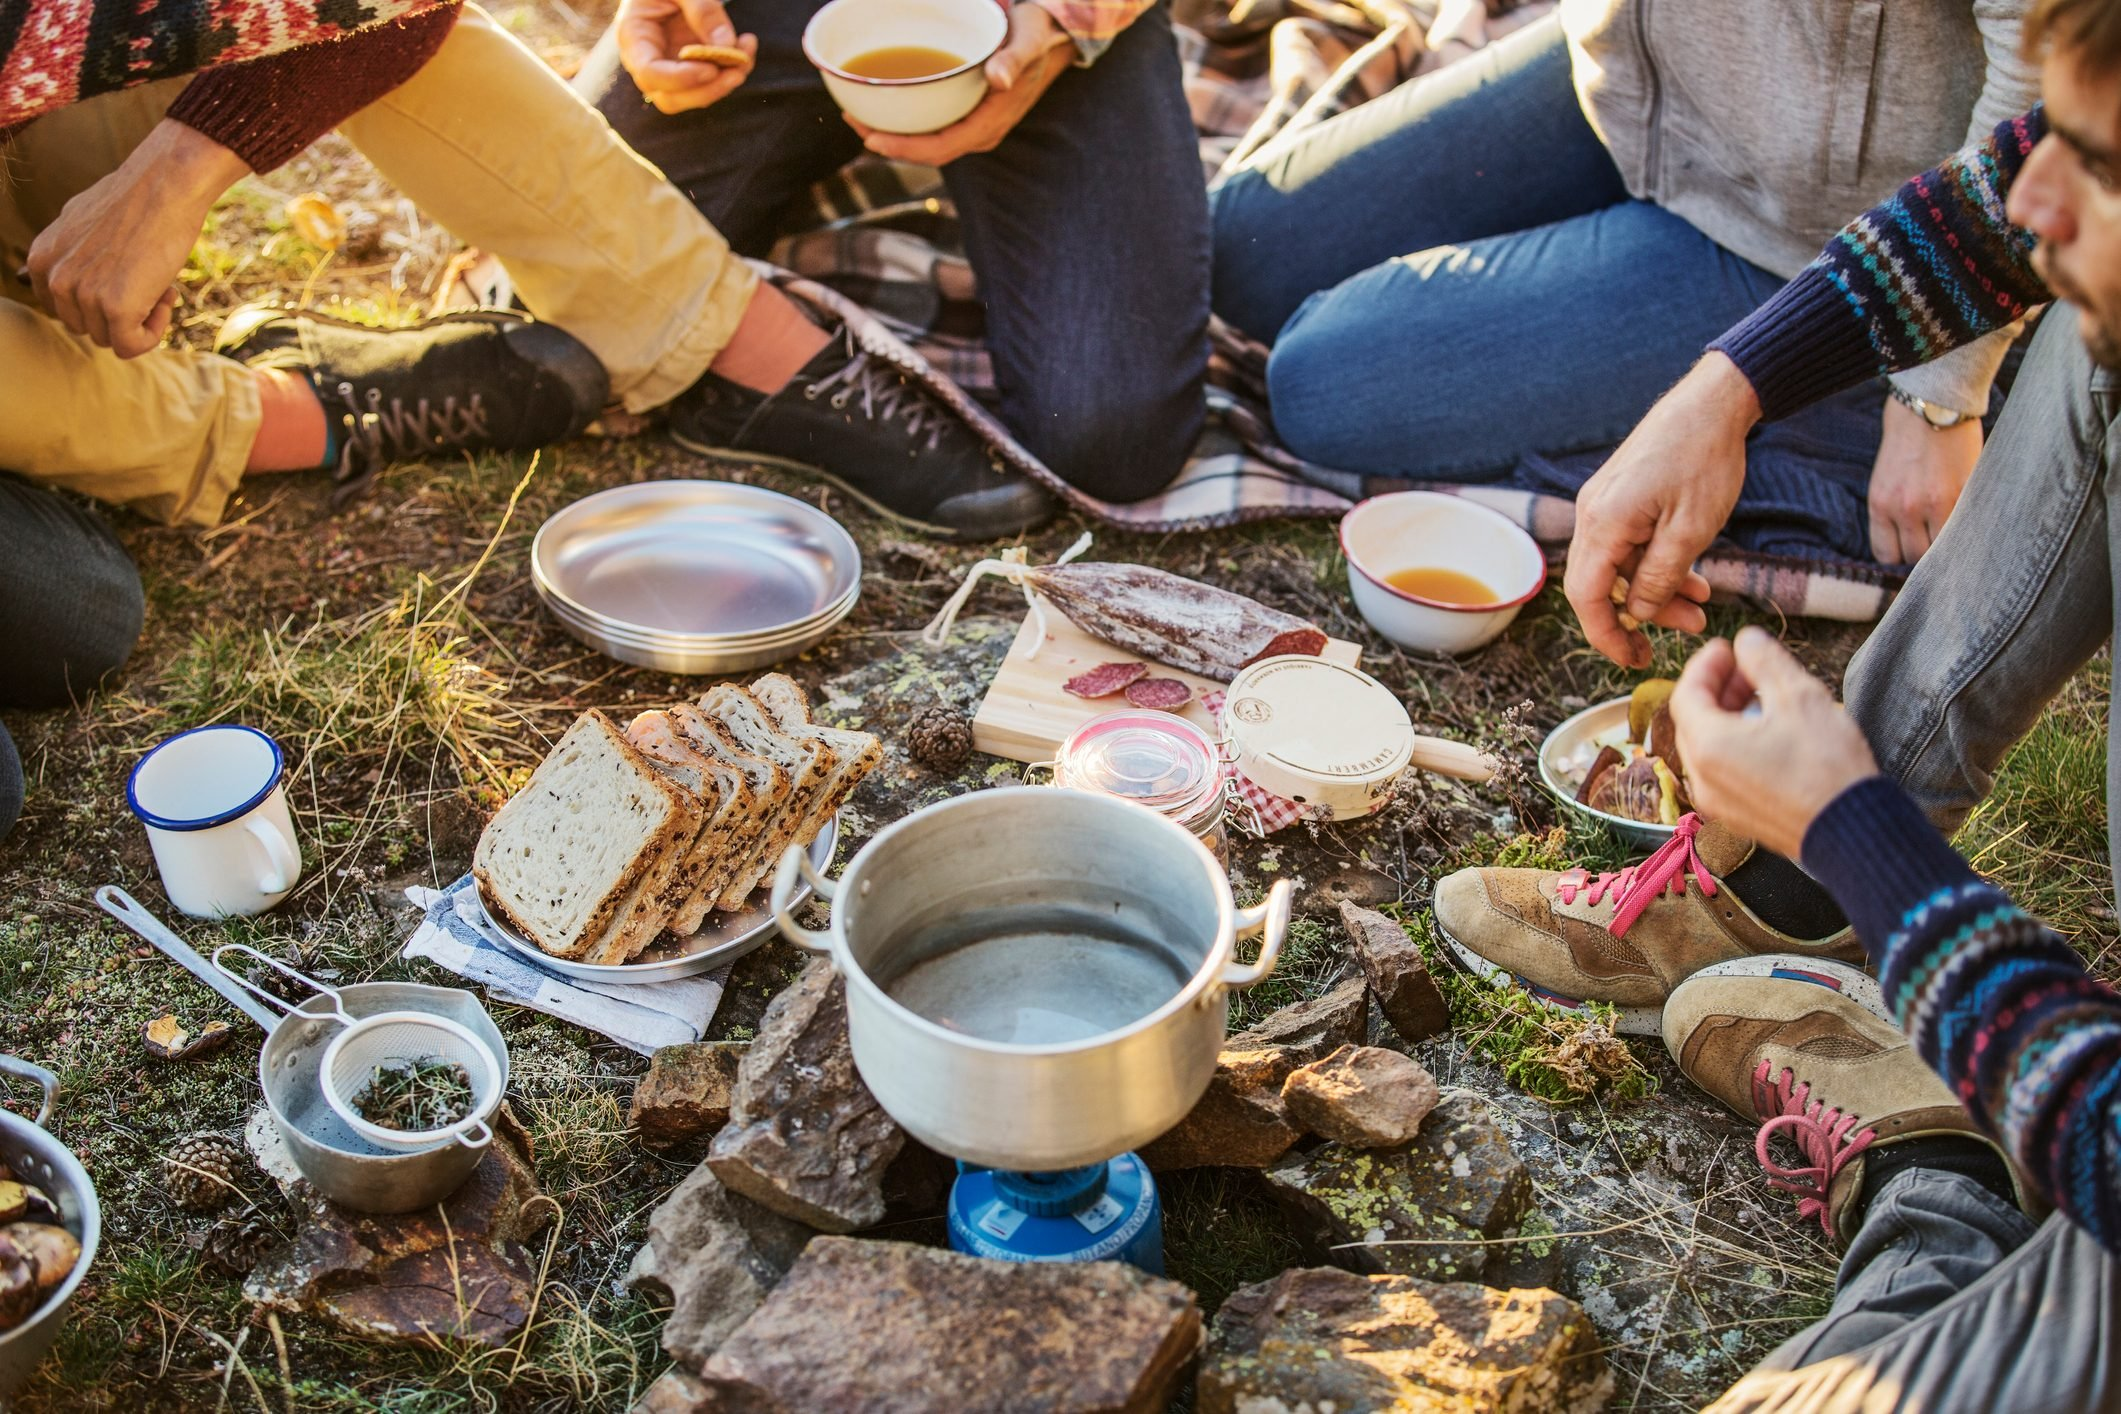 Friends preparing breakfast at campsite